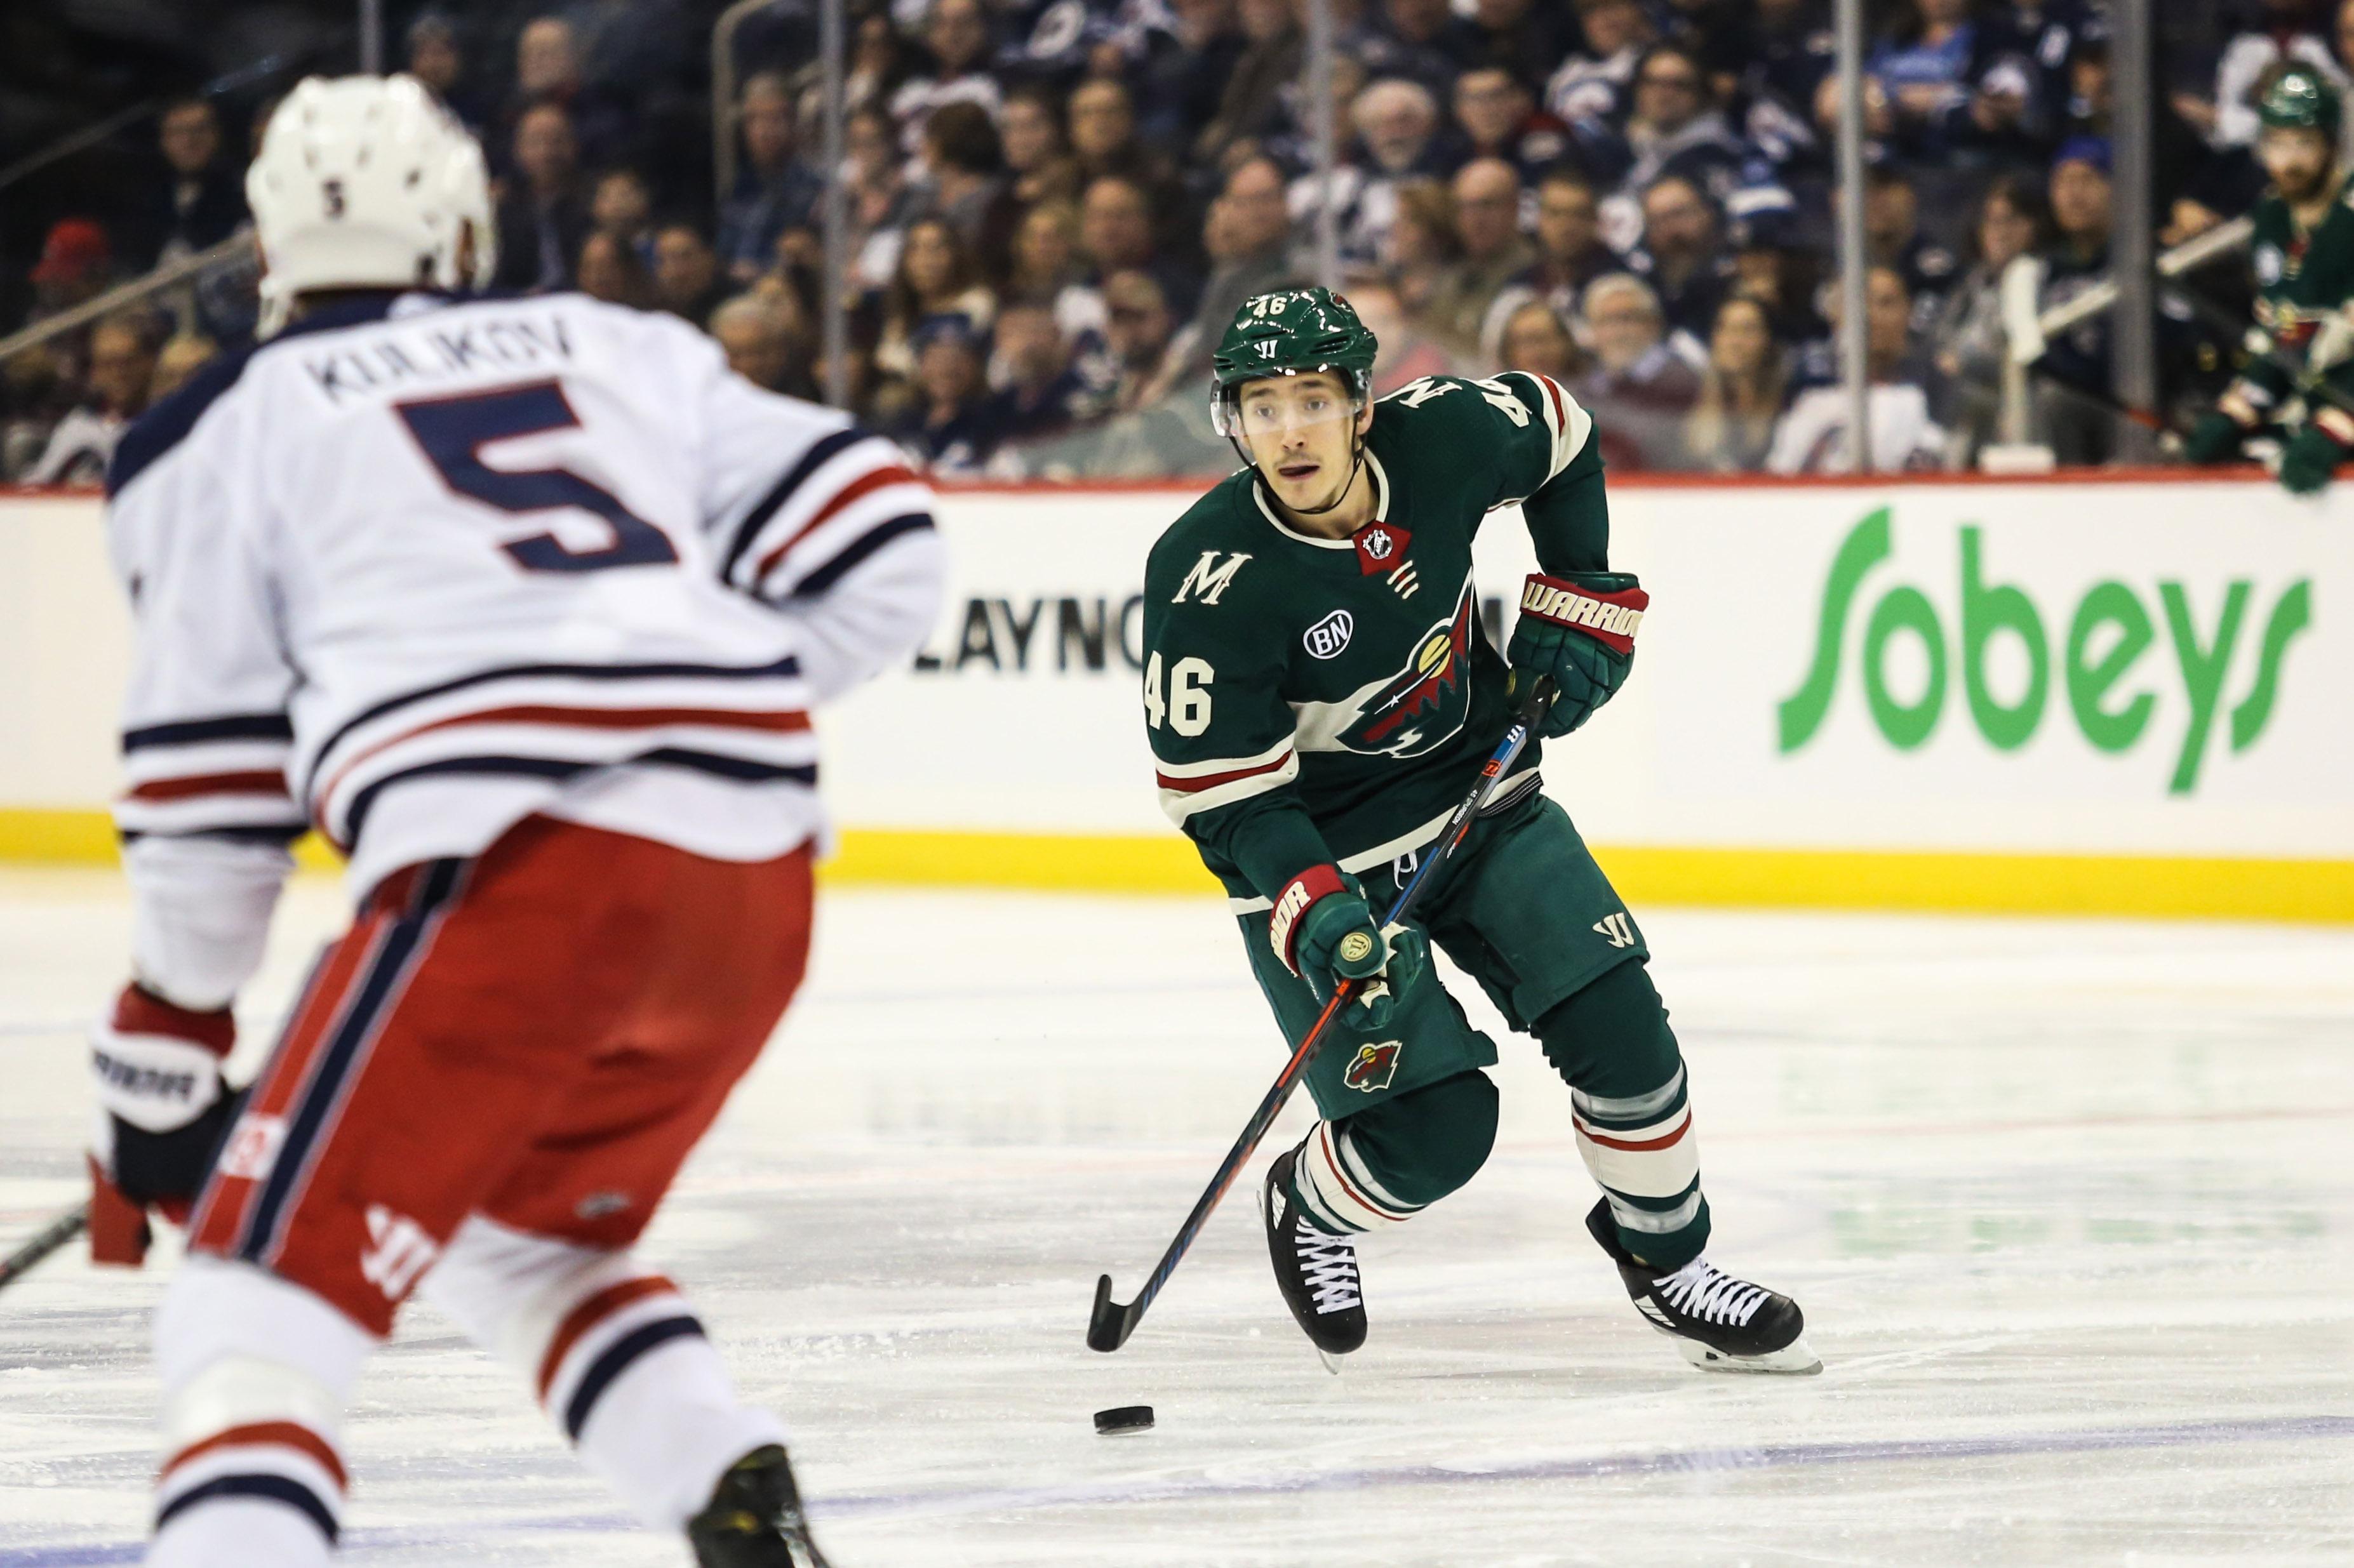 Game Preview: Minnesota Wild vs. Winnipeg Jets 4/2/19 @ 7:00PM CST at Xcel Energy Center